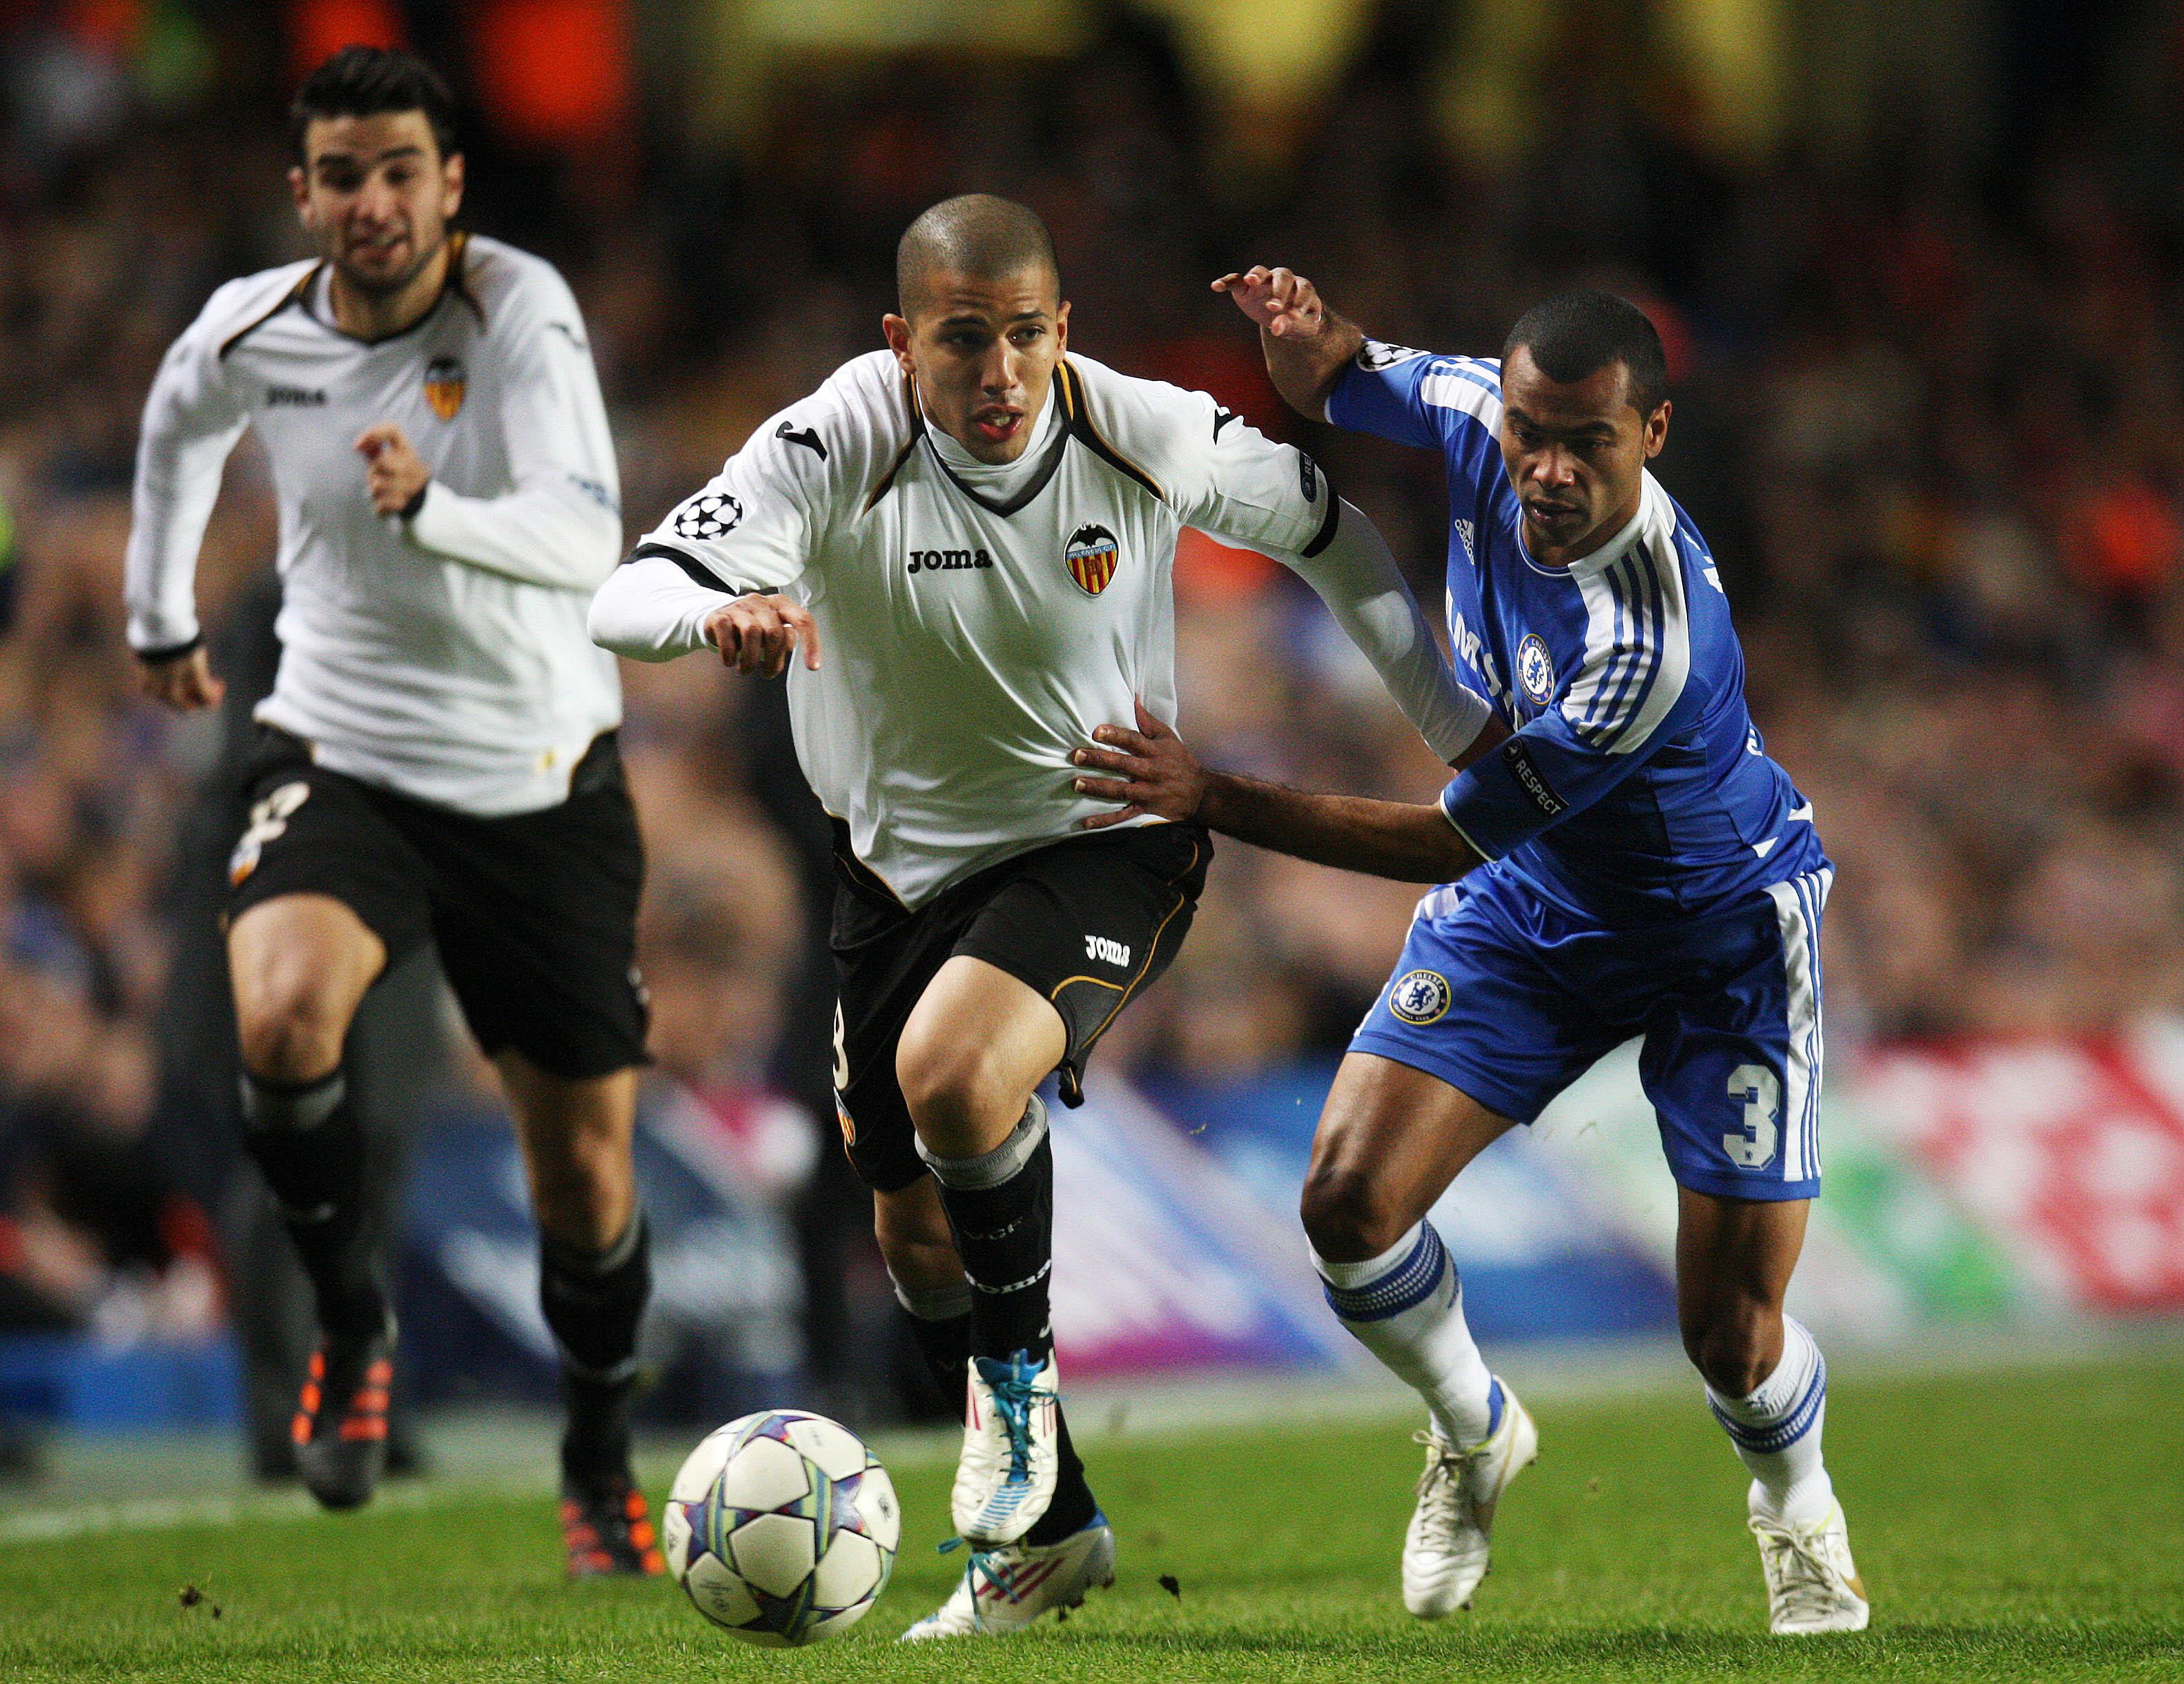 Chelsea Vs Valencia: Last 5 meetings